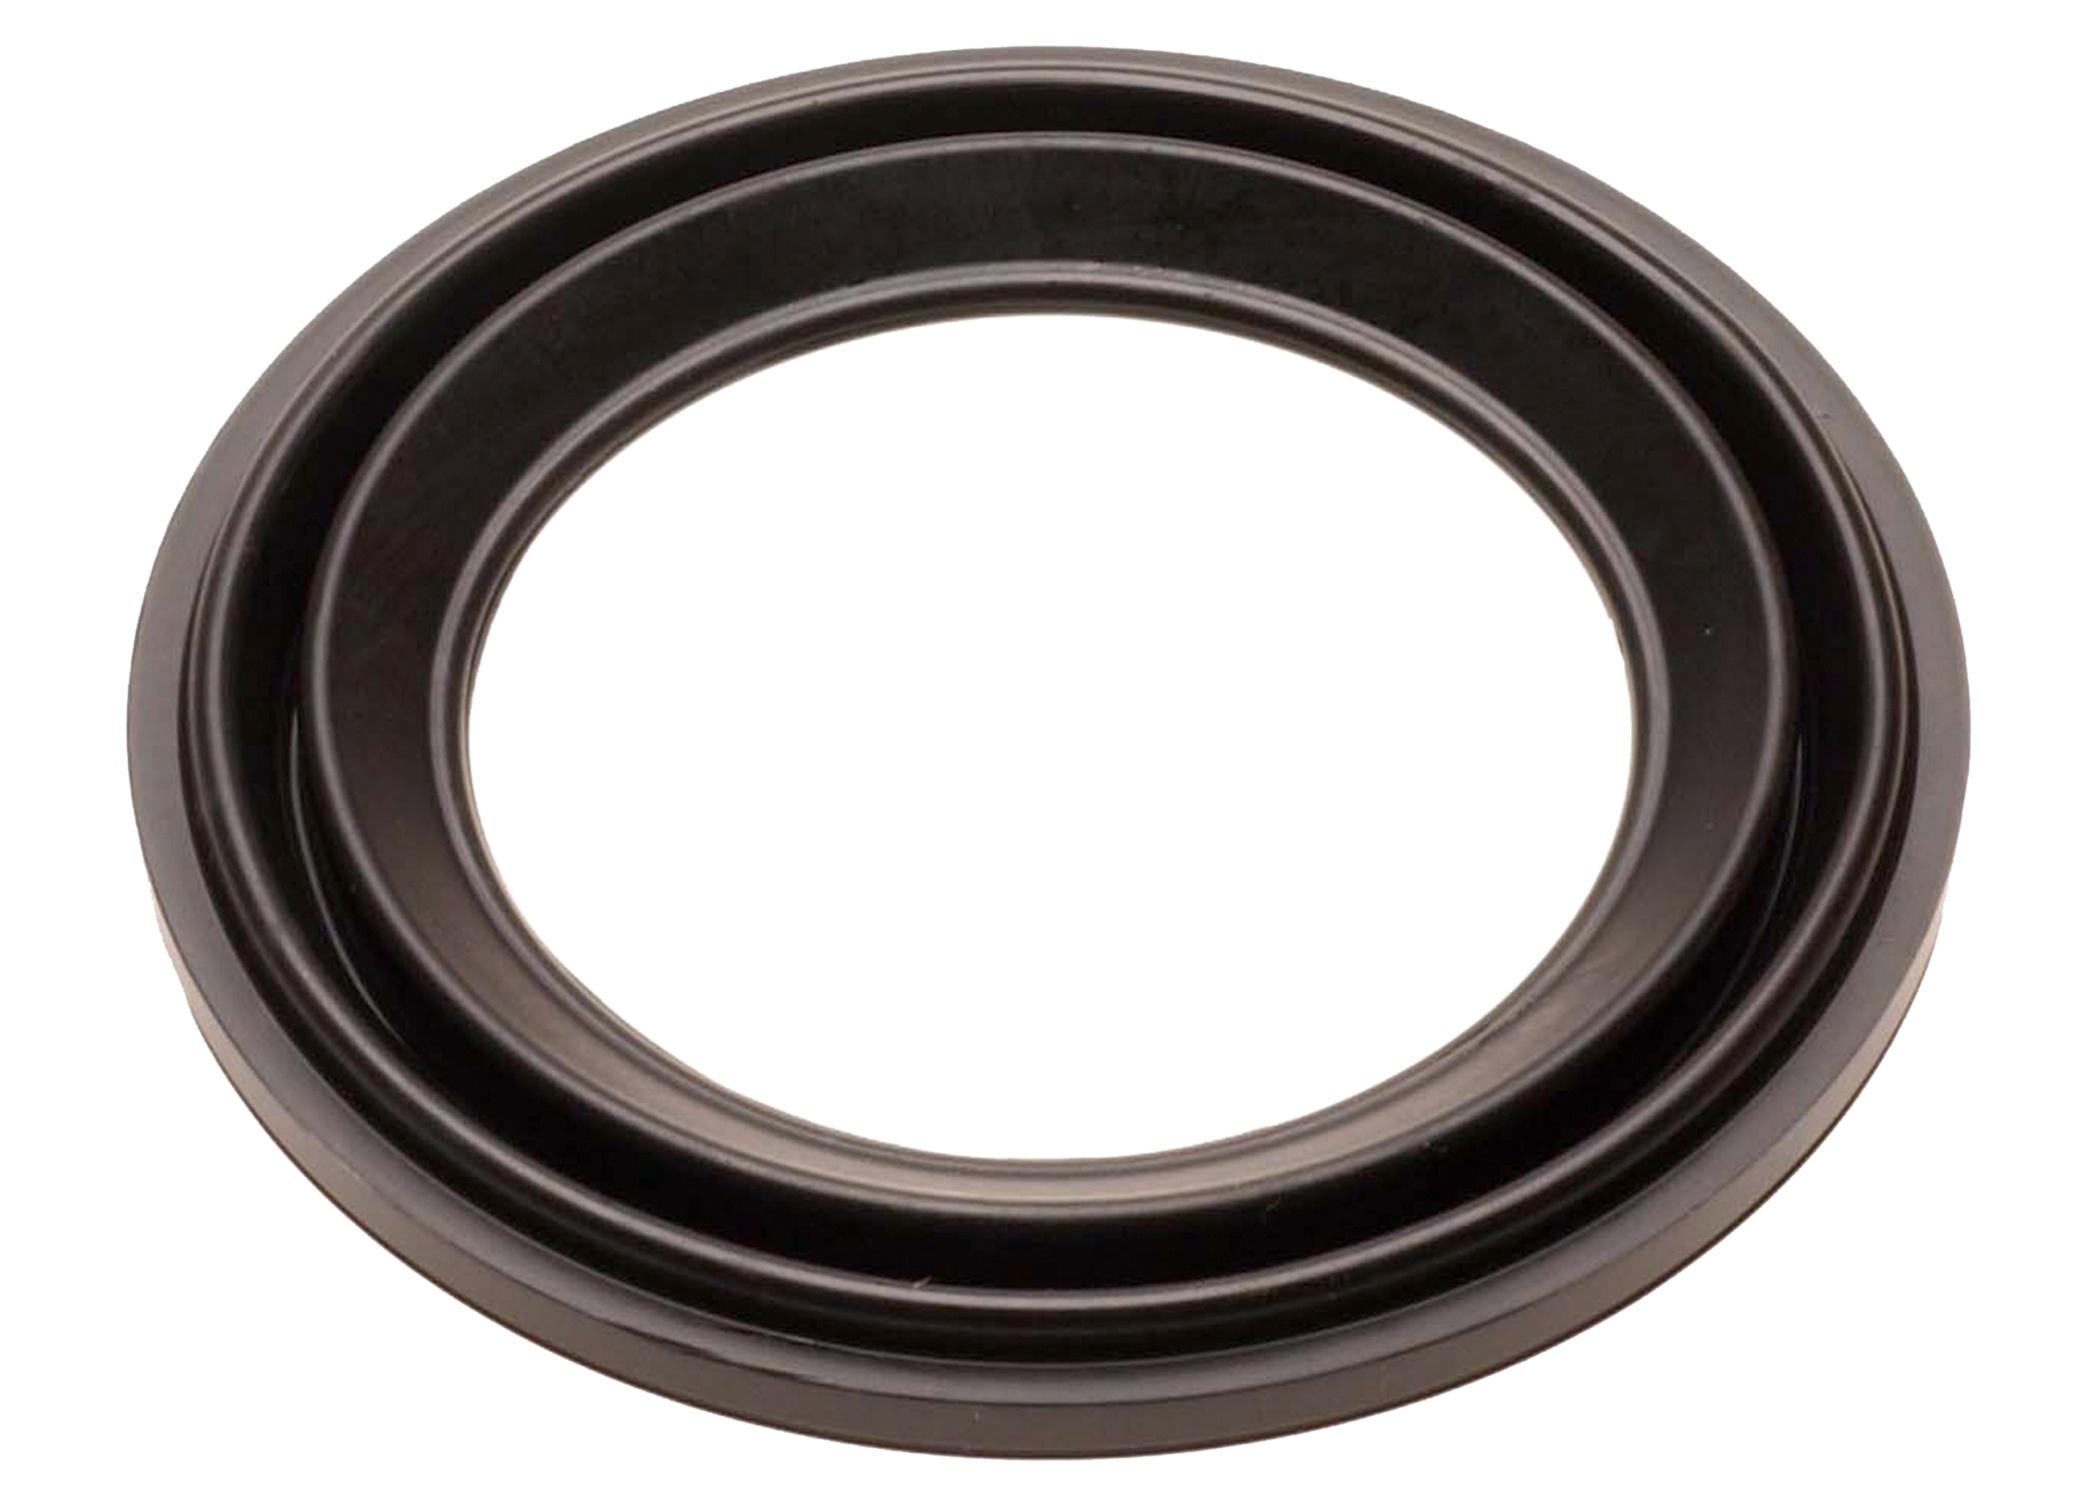 ACDELCO GM ORIGINAL EQUIPMENT - Disc Brake Caliper Piston Seal Kit - DCB 173-263